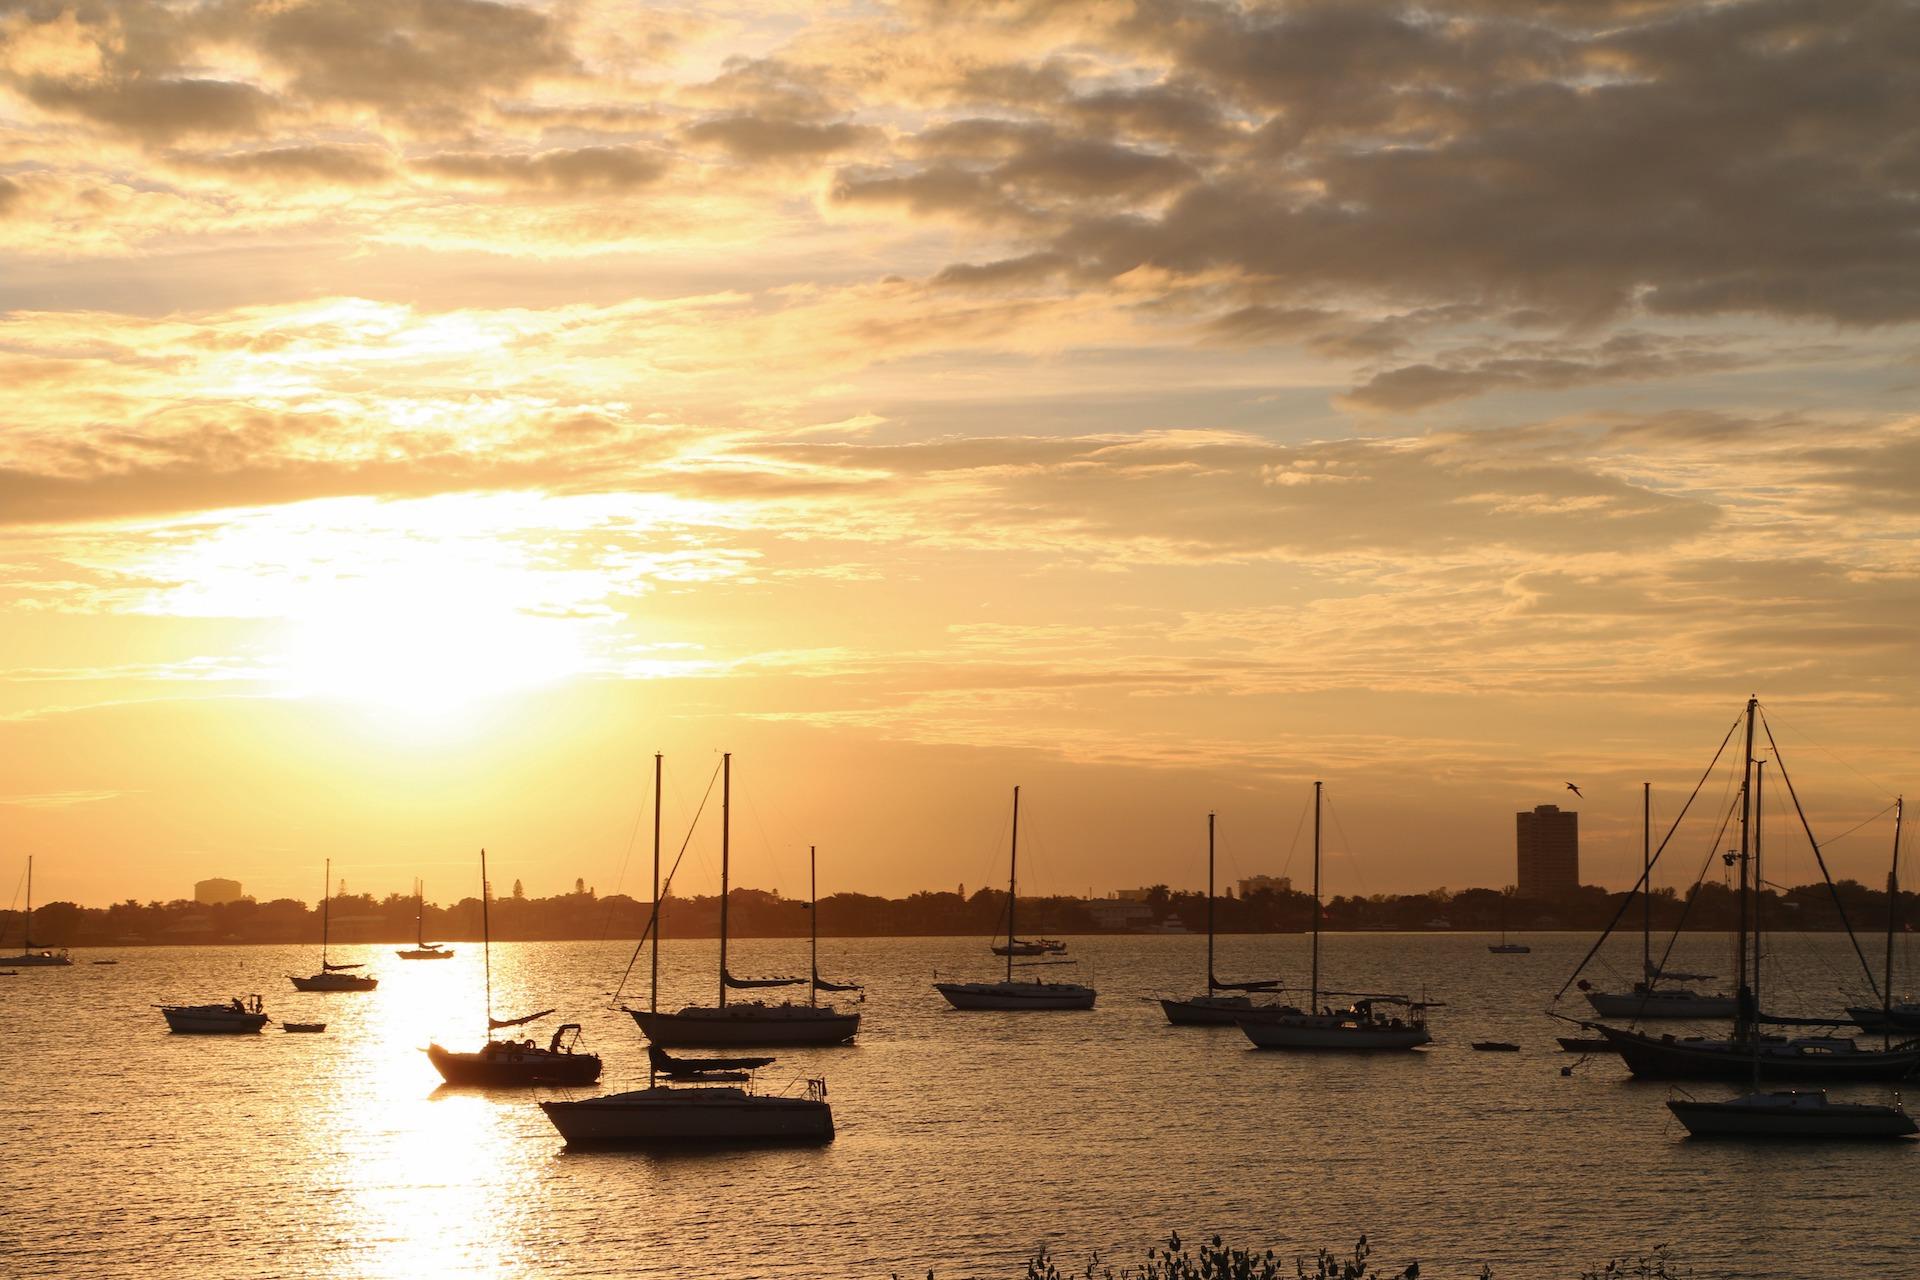 Sarasota Bay with boats in harbor.jpg